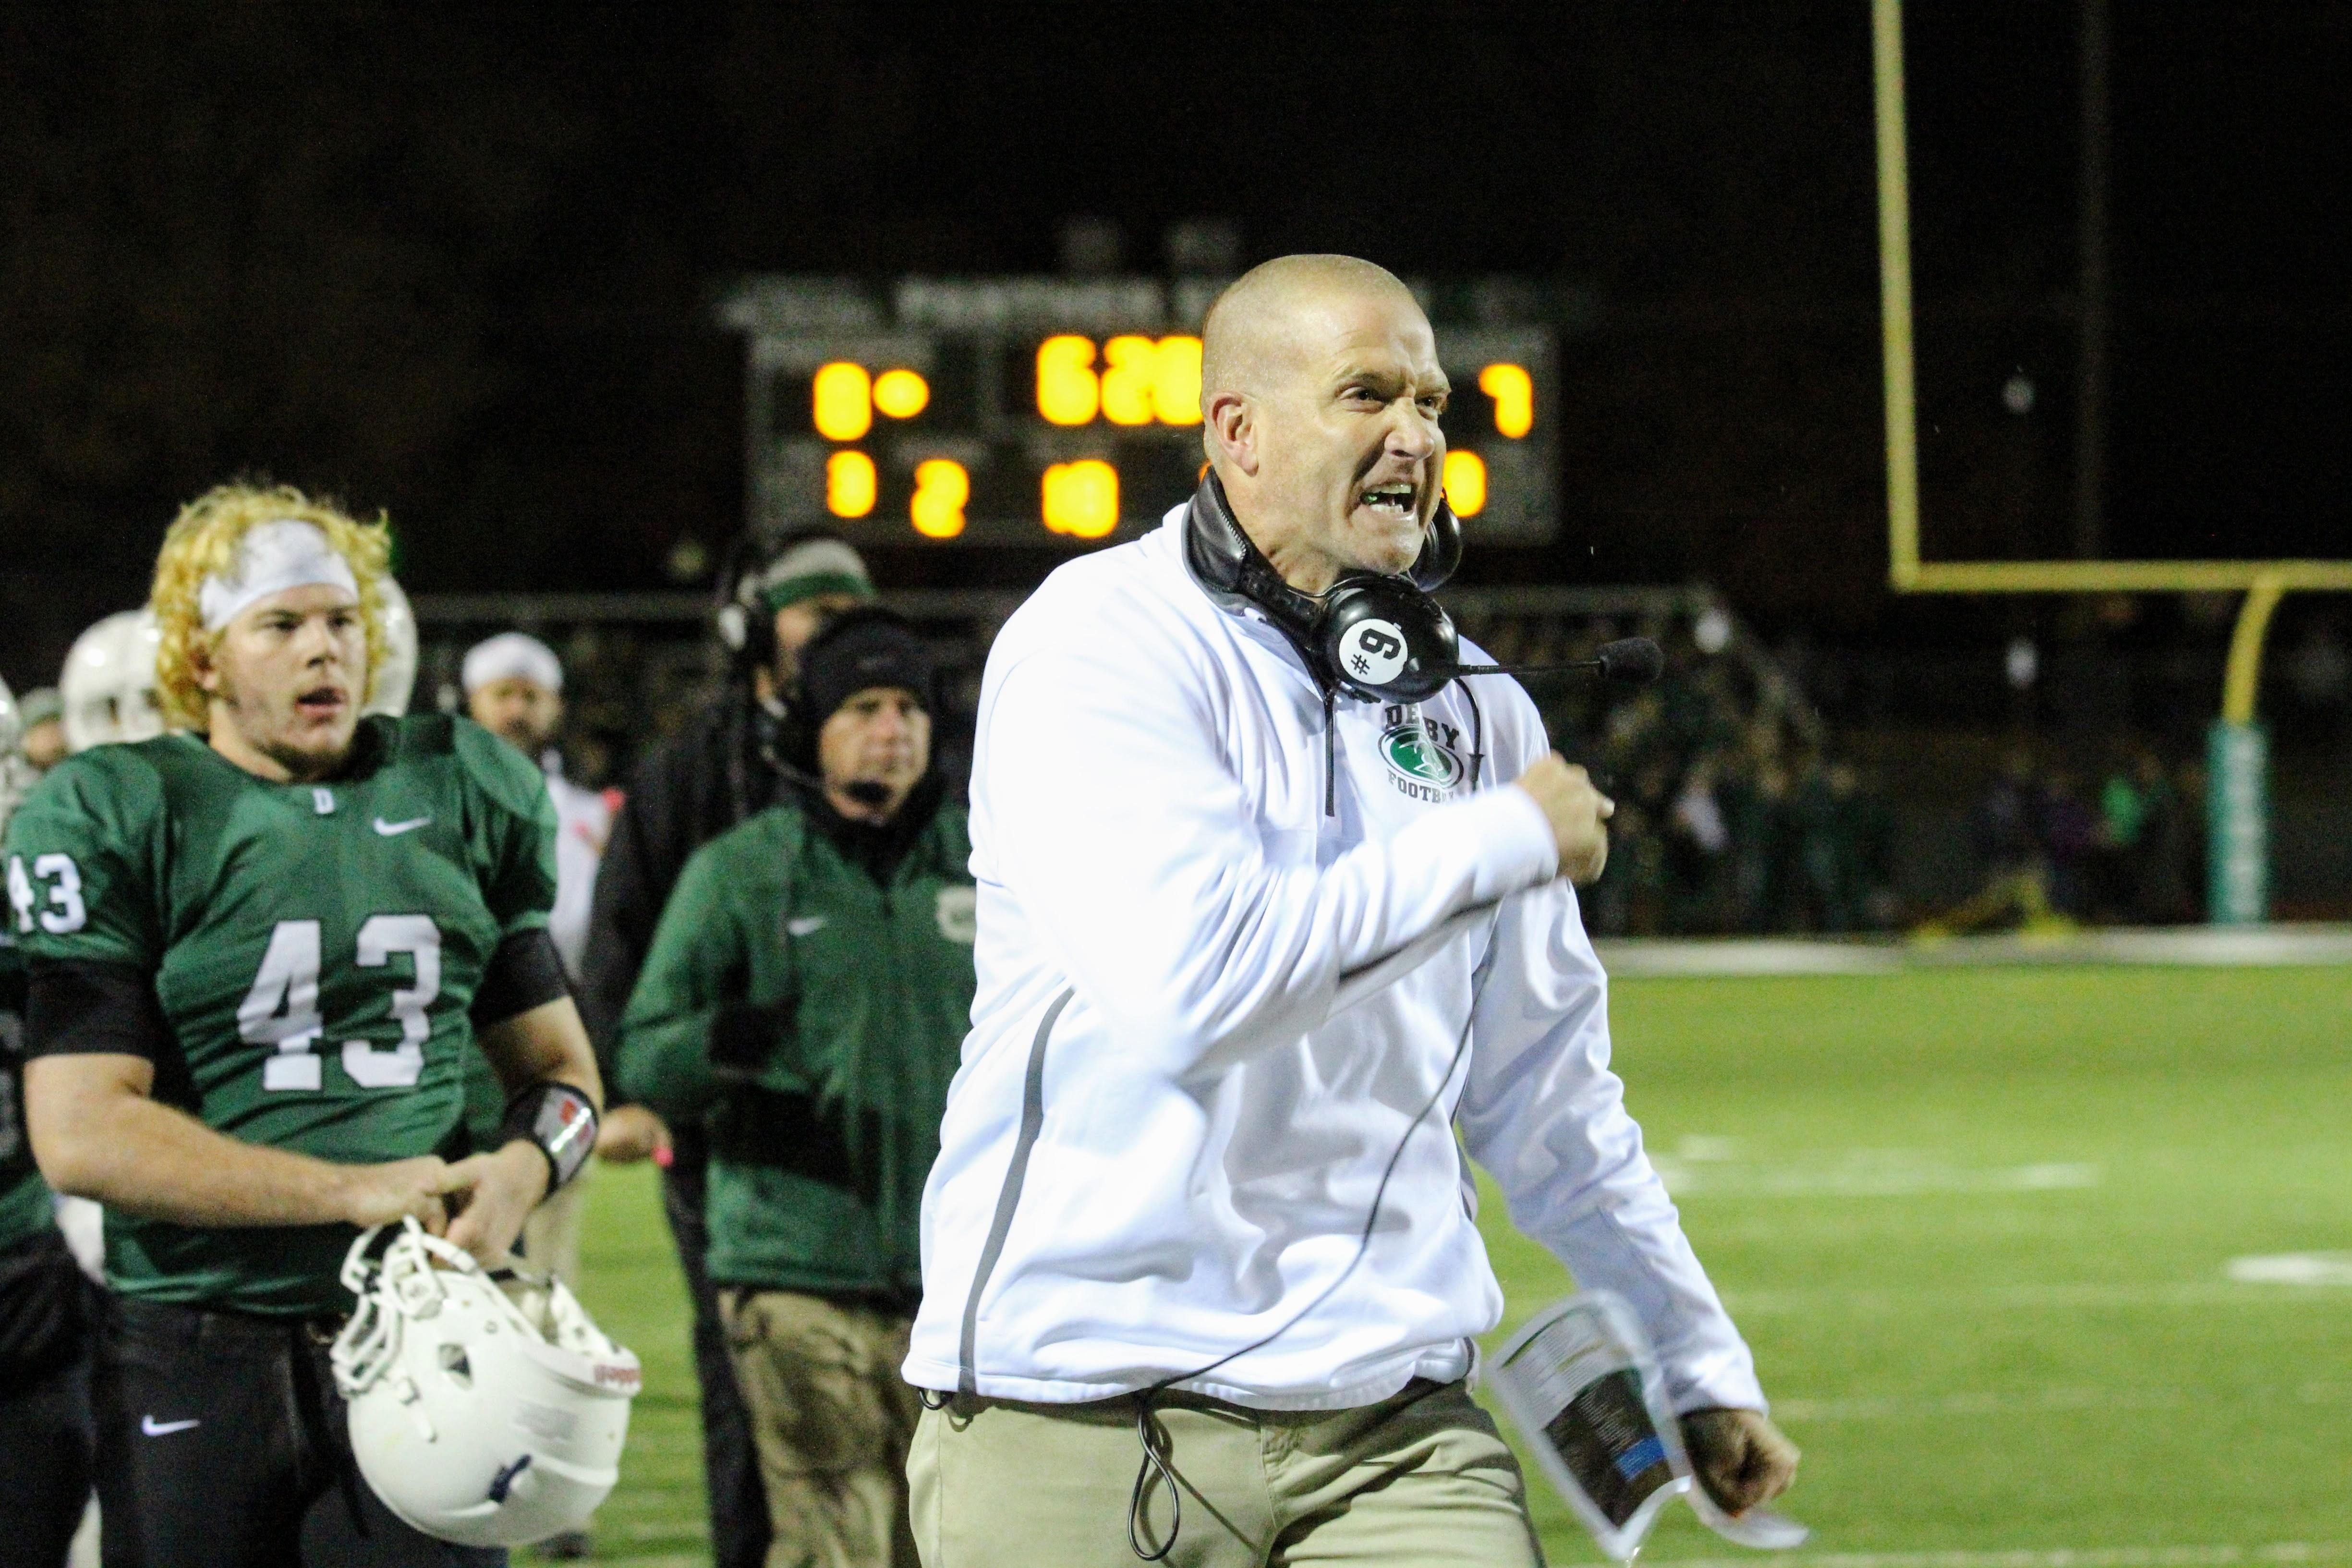 Head Coach Brandon Clark